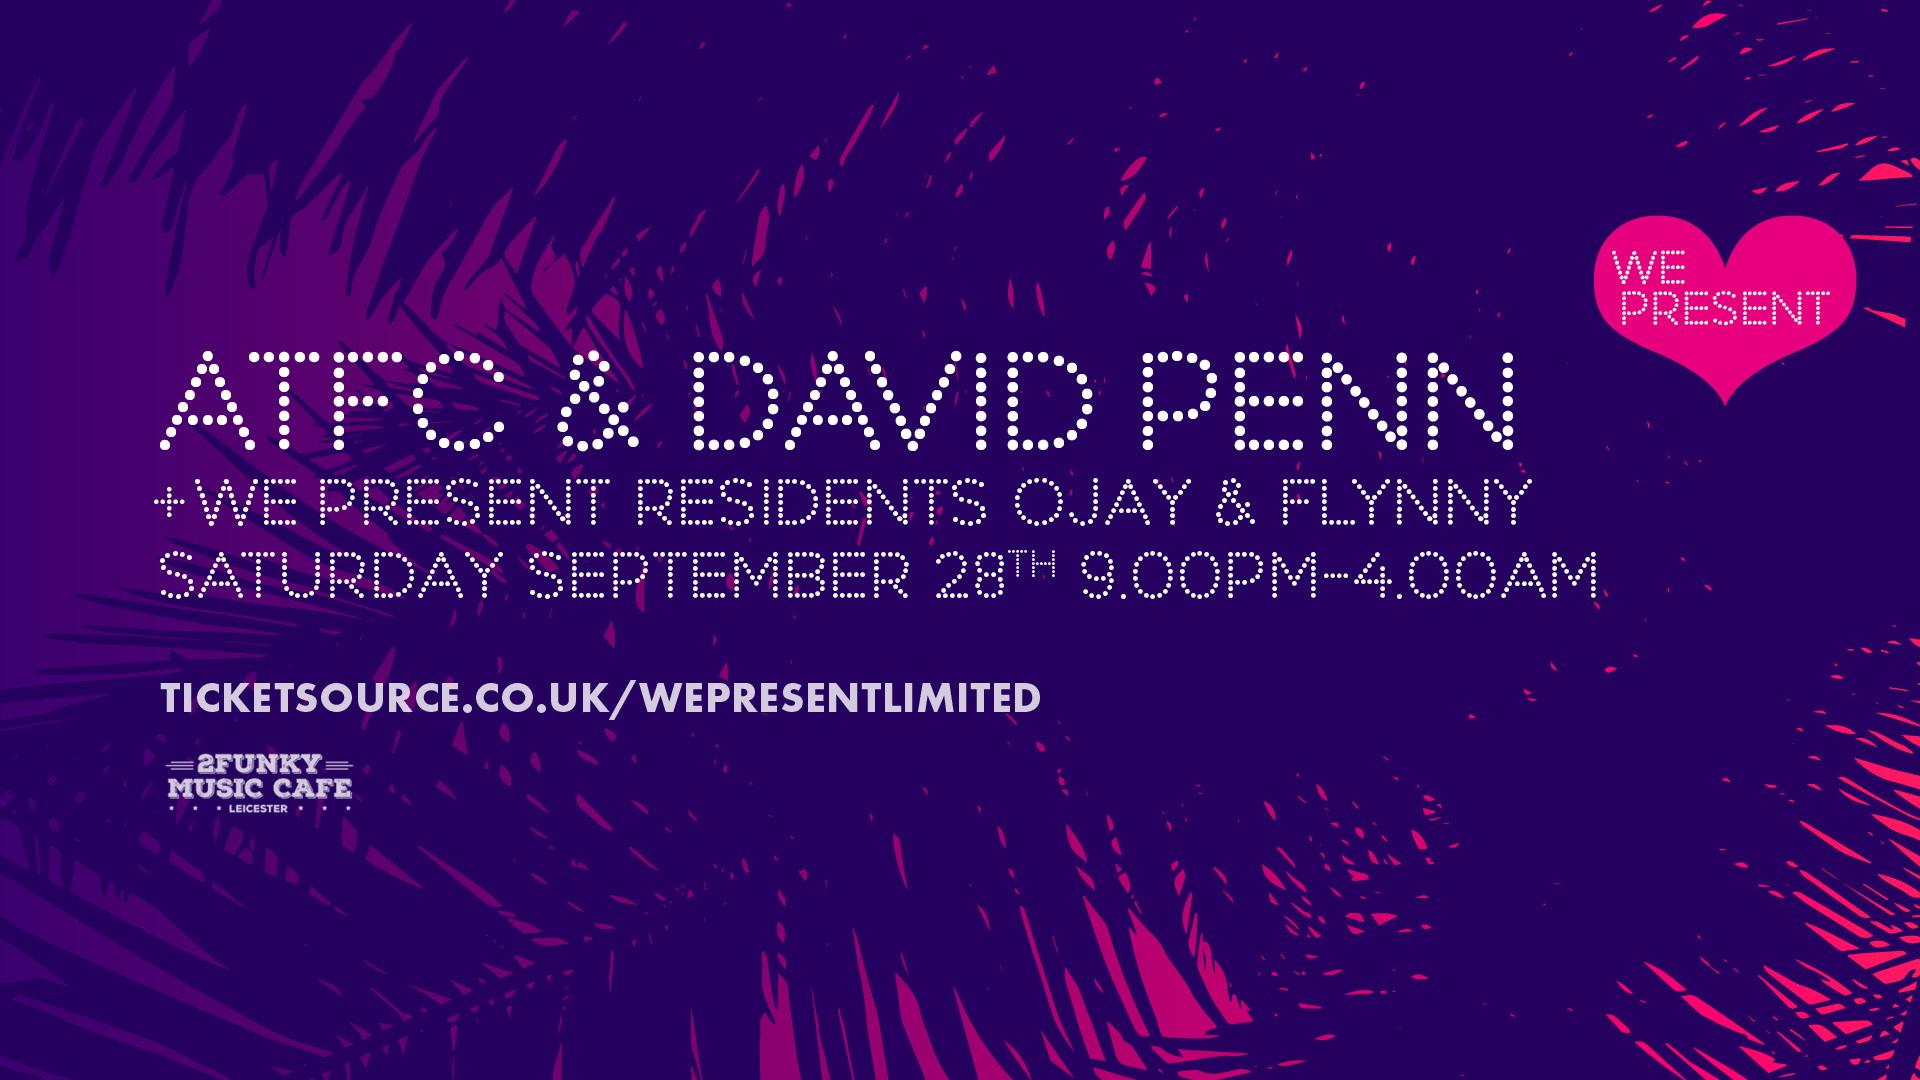 We Present - ATFC and David Penn banner image